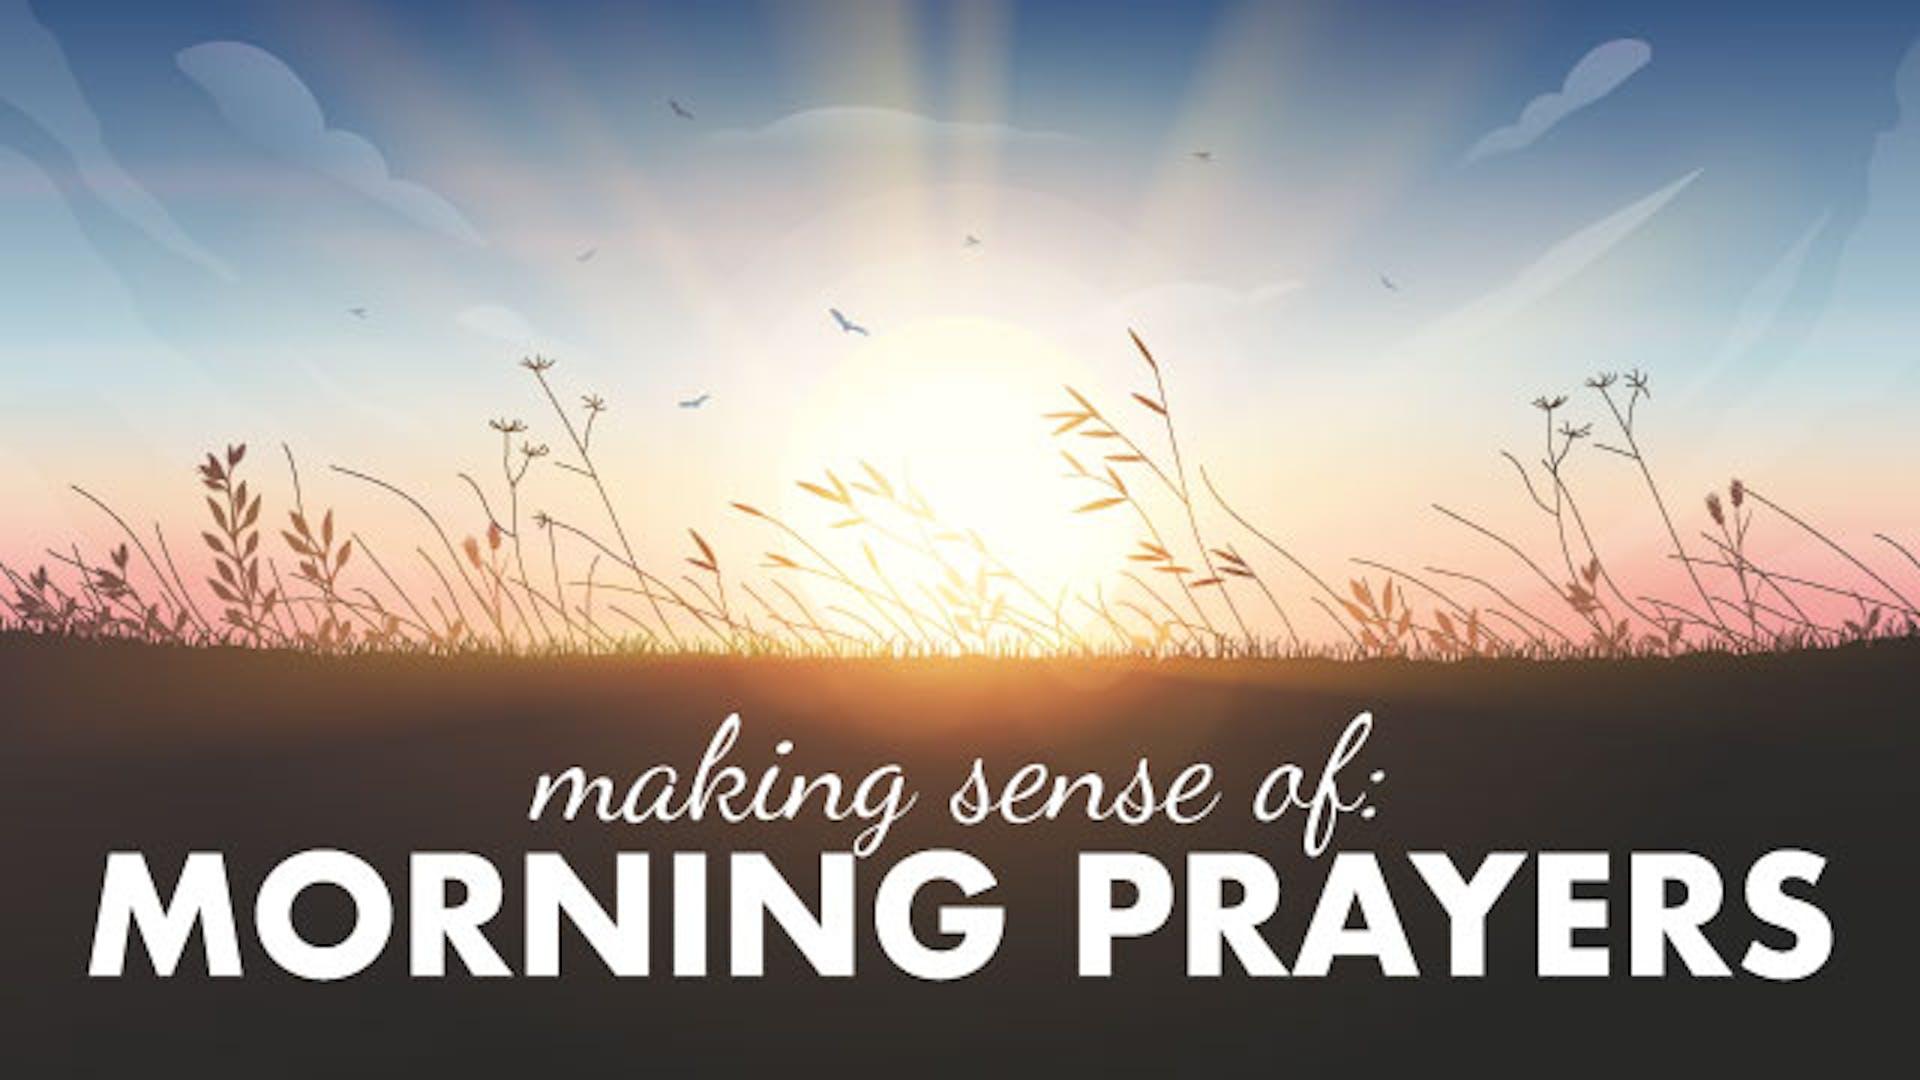 shacharit jewish morning prayer